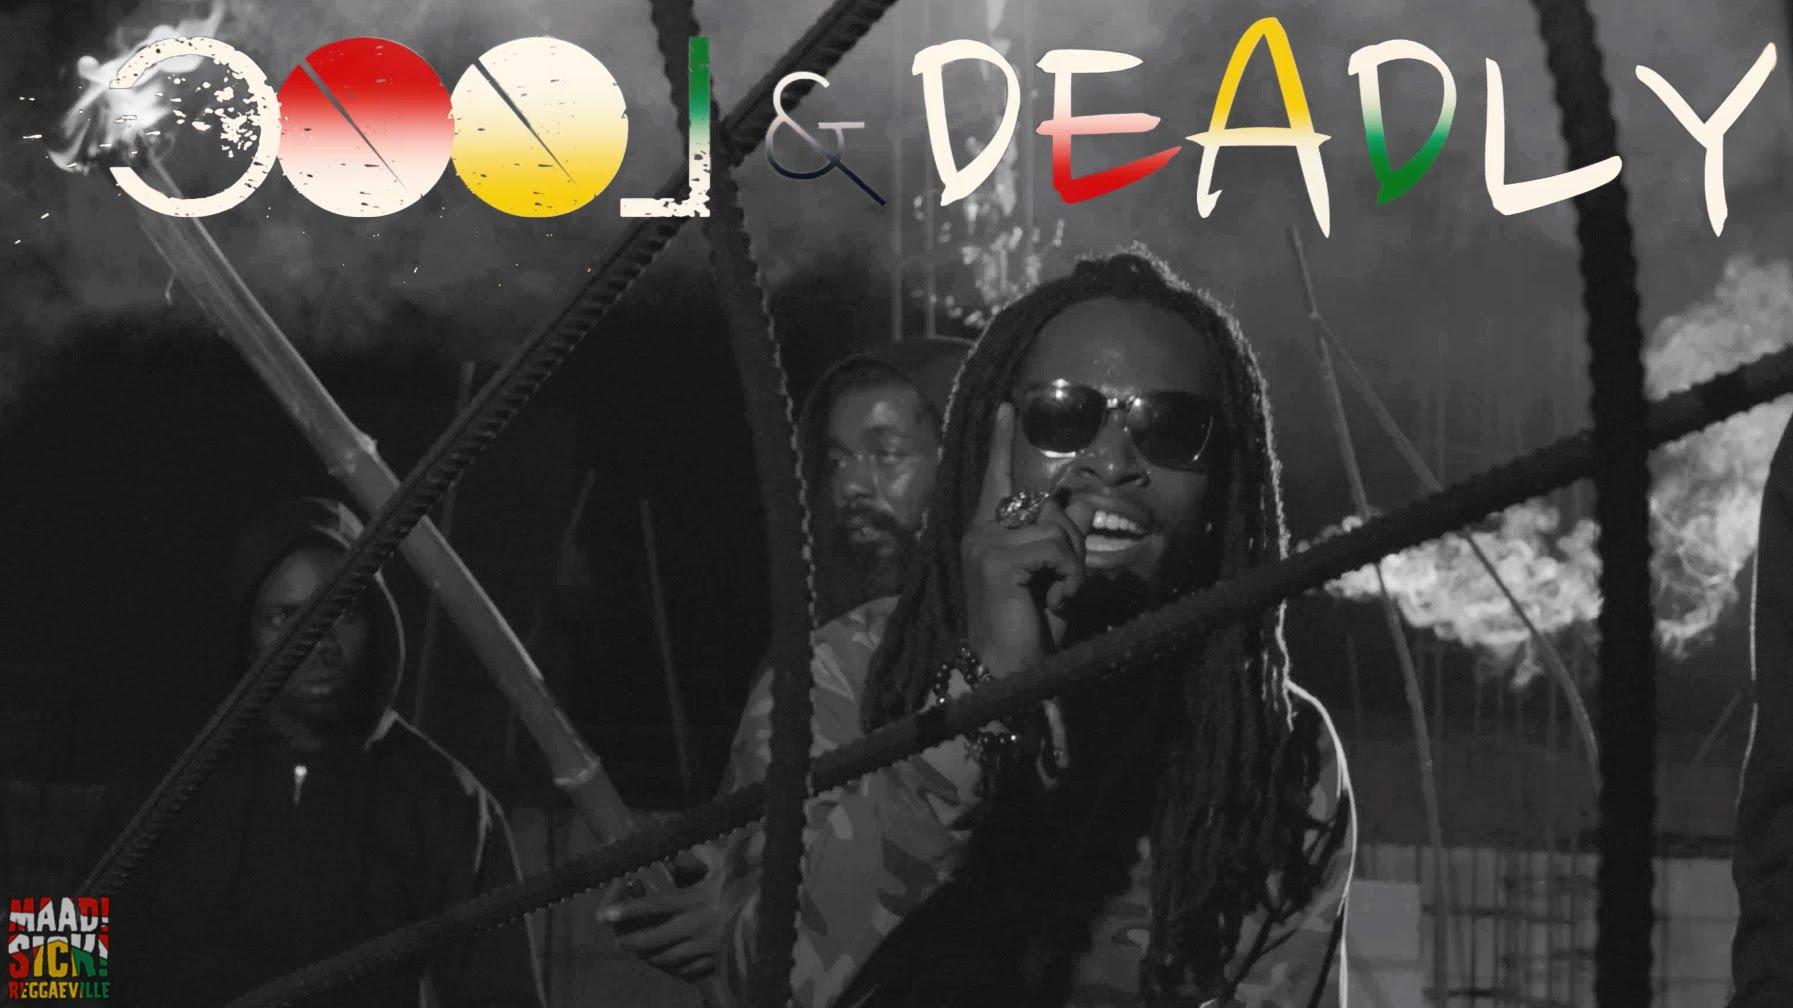 Jesse Royal - Cool & Deadly [3/22/2016]